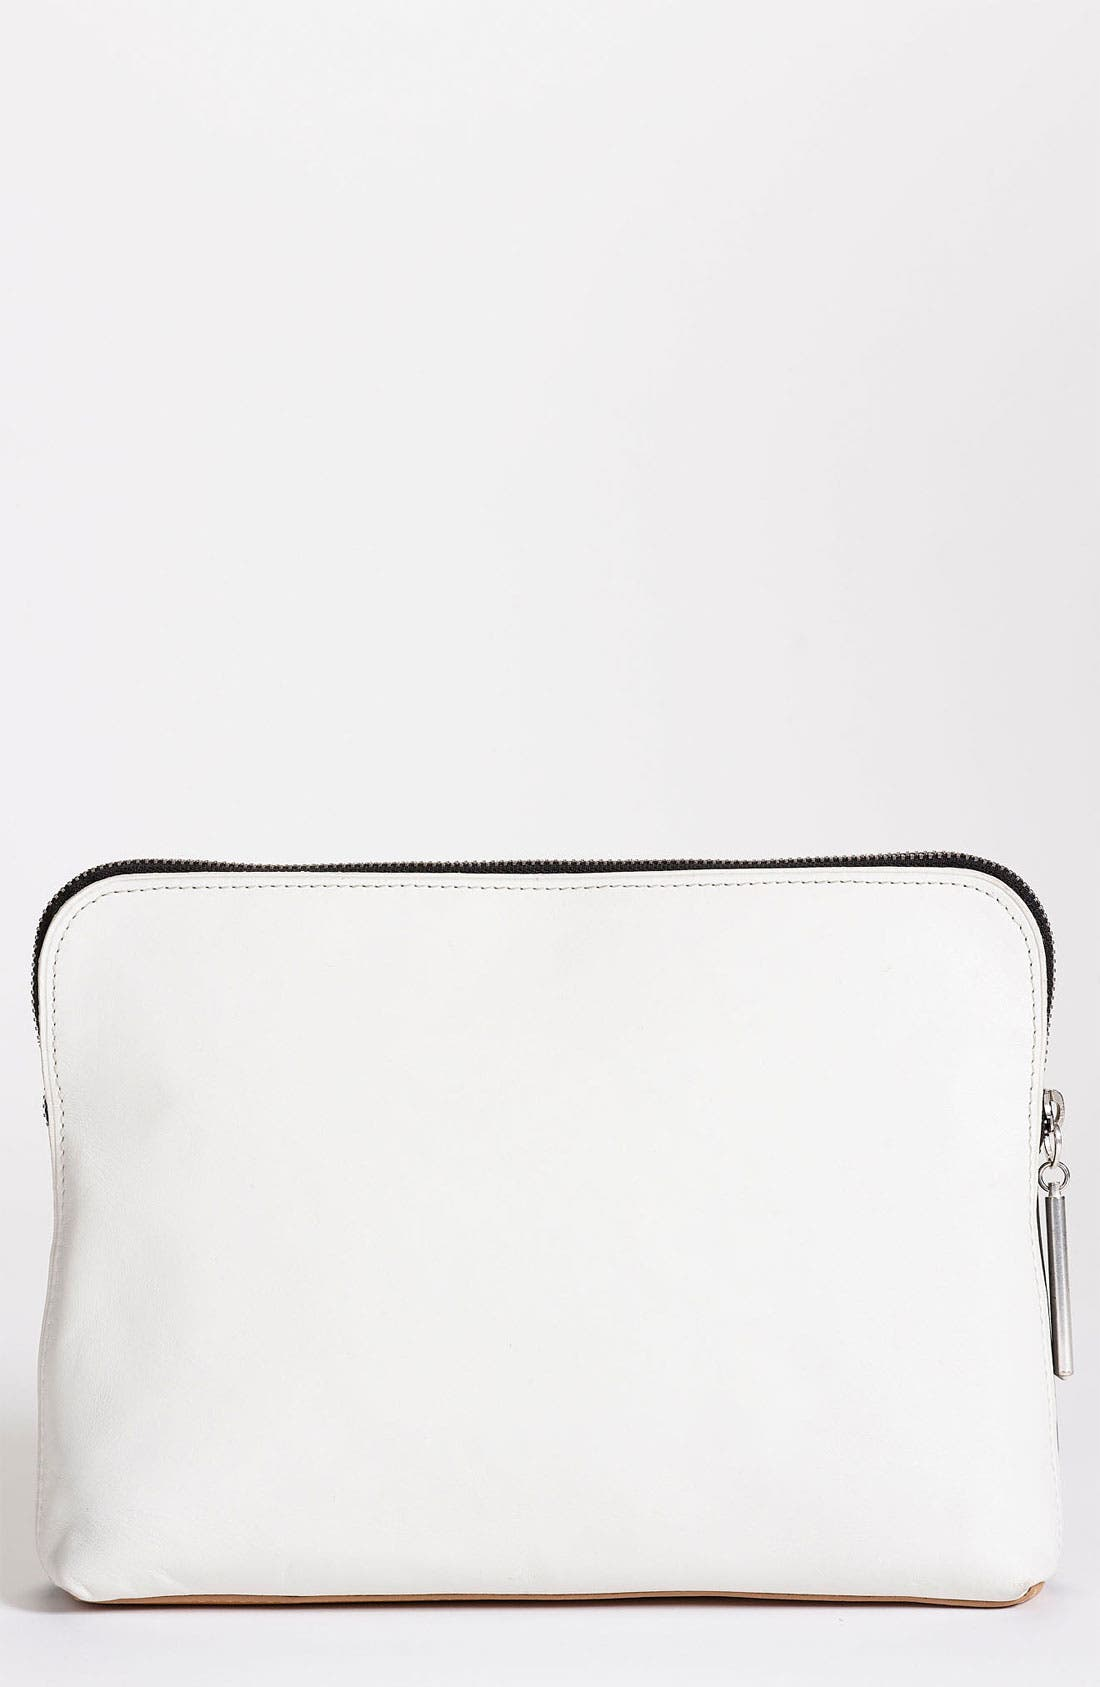 Main Image - 3.1 Phillip Lim '31 Minute' Leather Bag